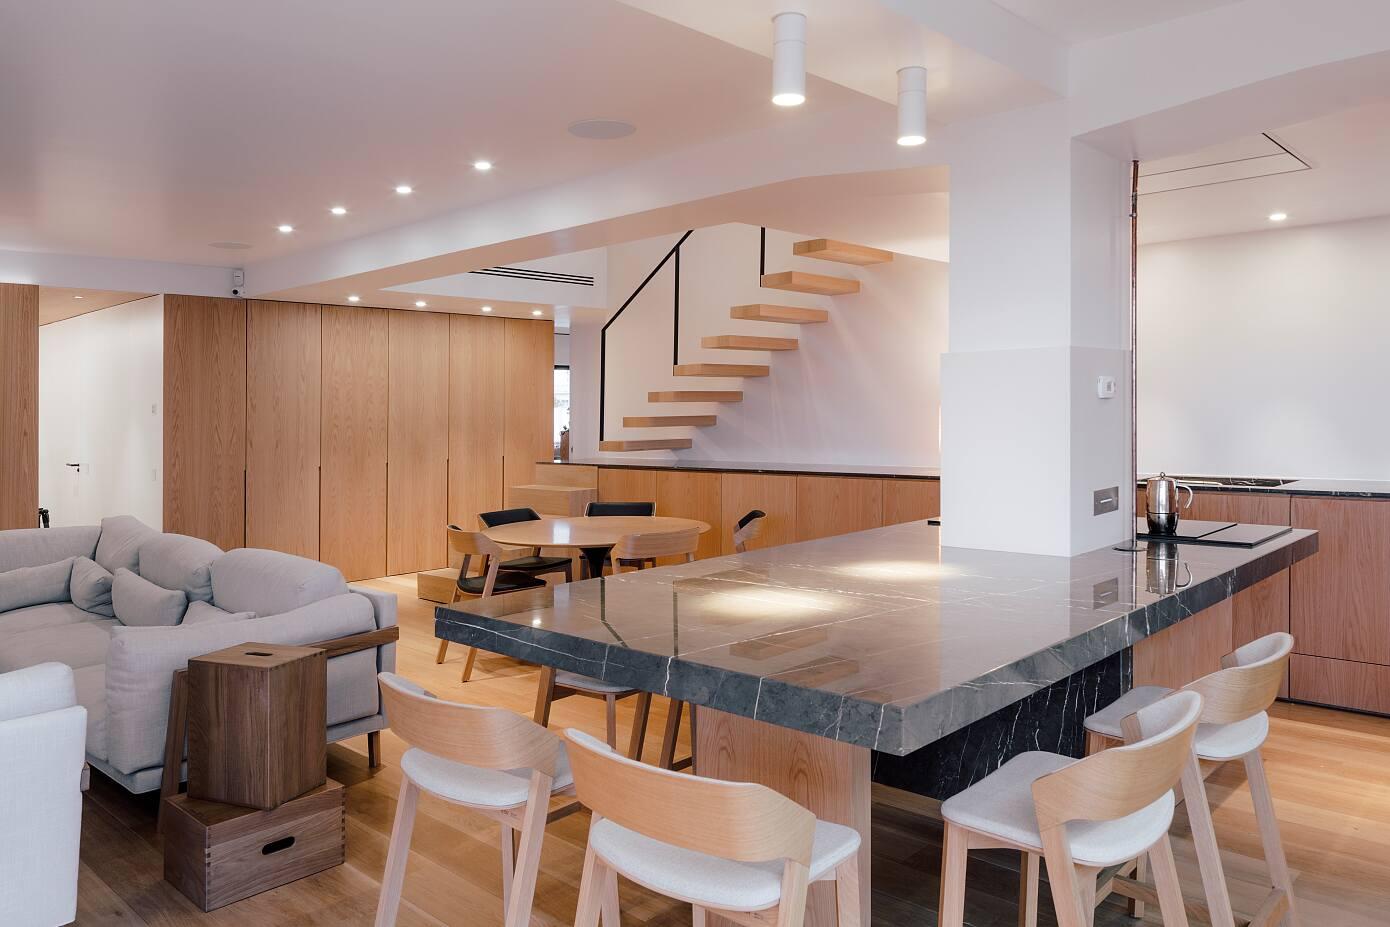 Casa Paco by Miguel Crespo Picot